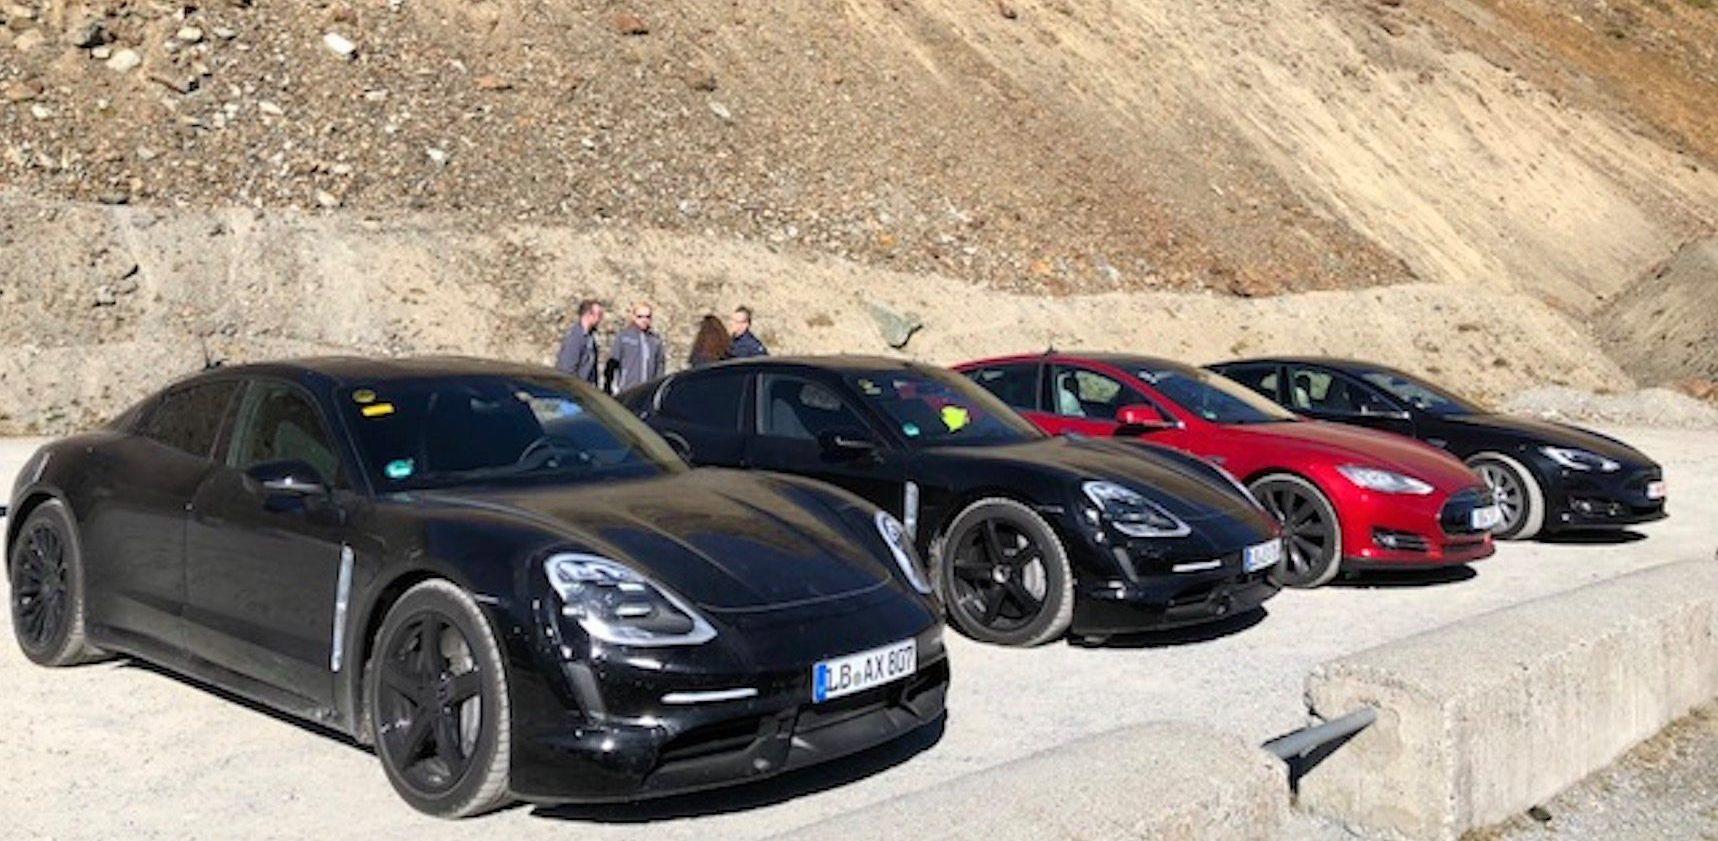 Porsche Taycan Electrek